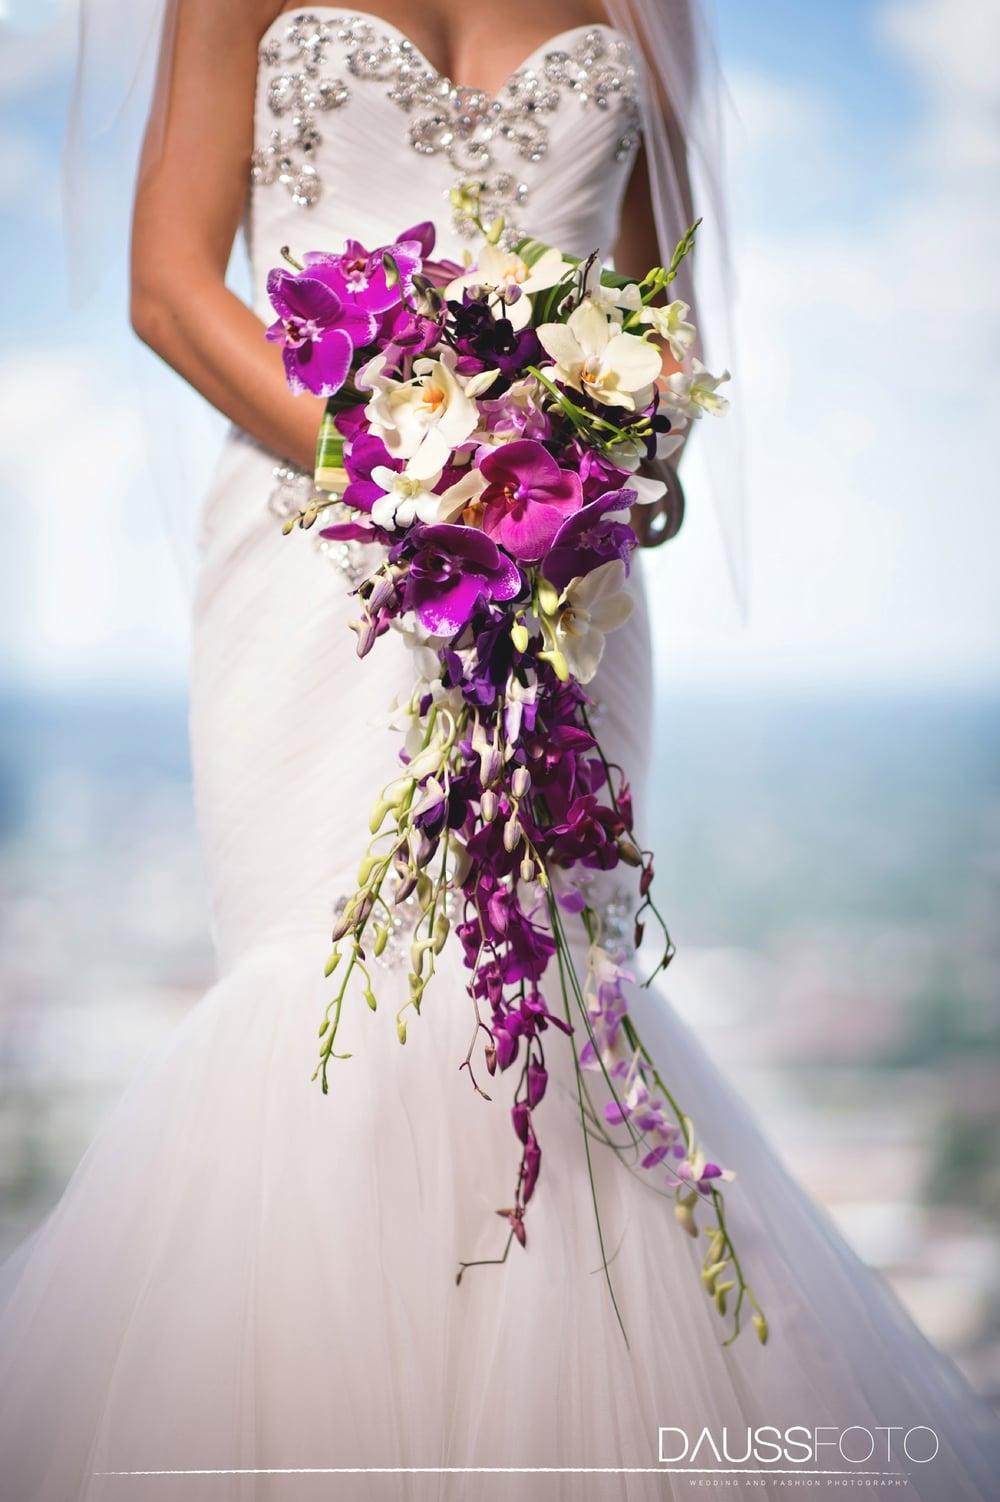 DaussFOTO_20150721_025_Indiana Wedding Photographer.jpg